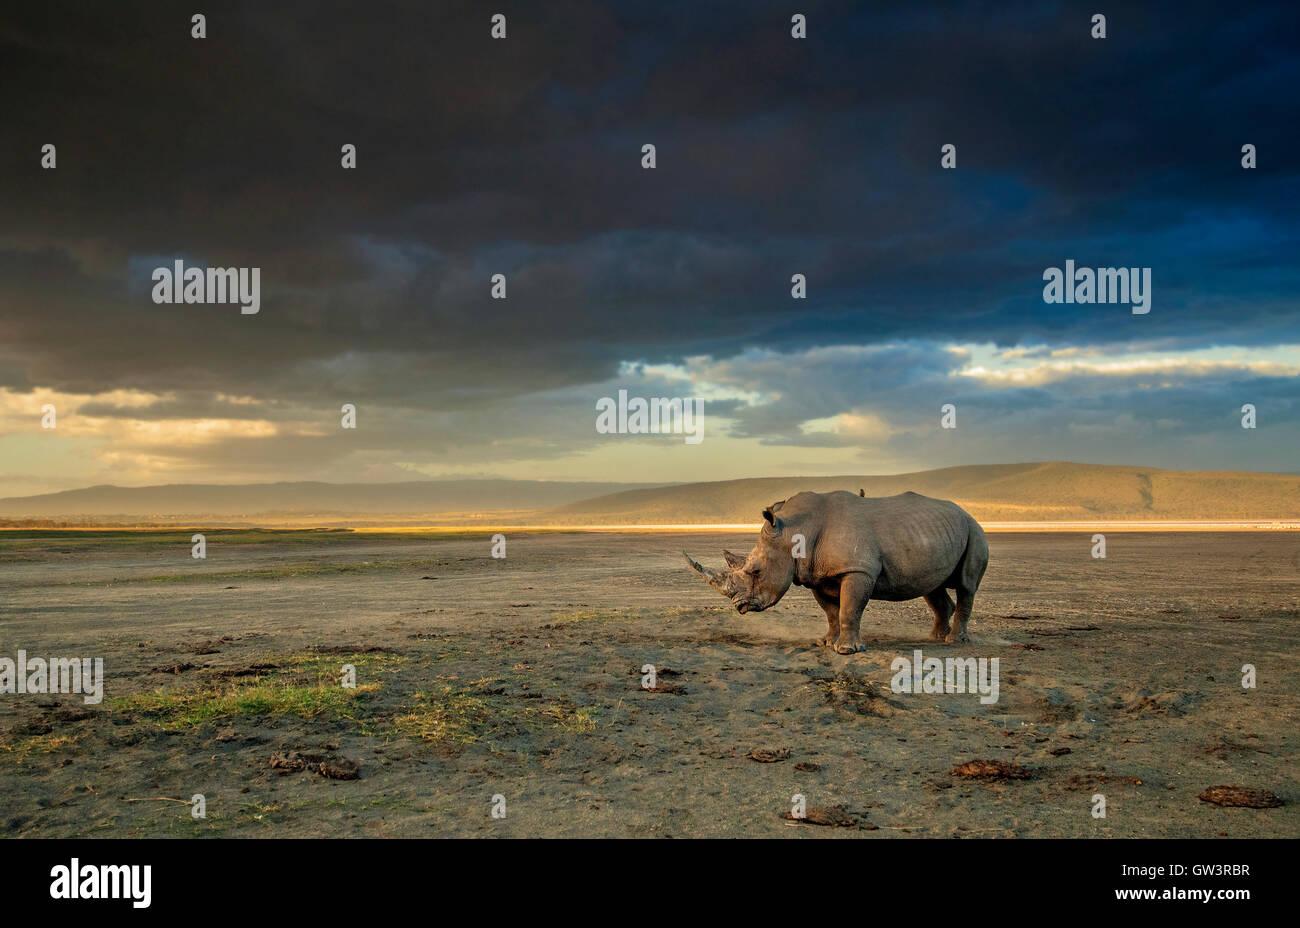 Rhino in a storm. Lake Nakuru, Kenya - Stock Image